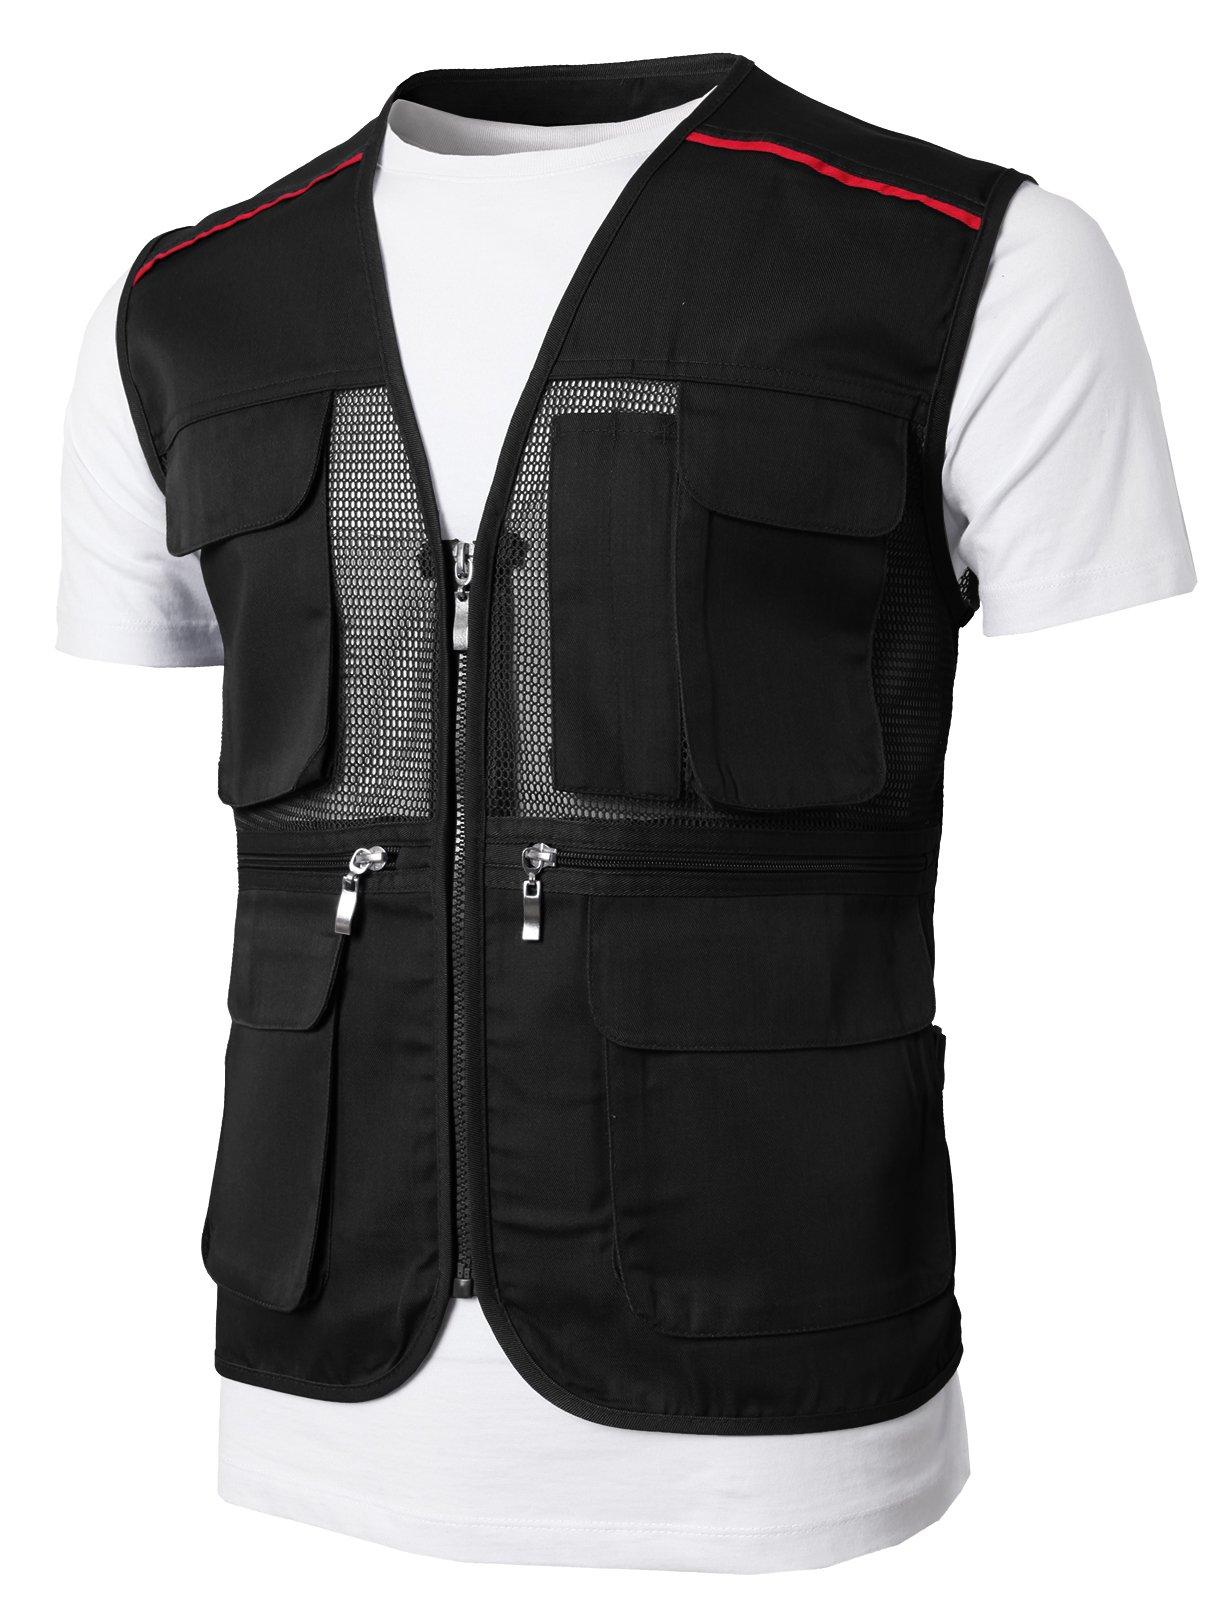 H2H Men's Outdoor Multifunction Multi-pocket Mesh Fishing Vest Of Line Point BLACK US M/Asia L (KMOV0146)